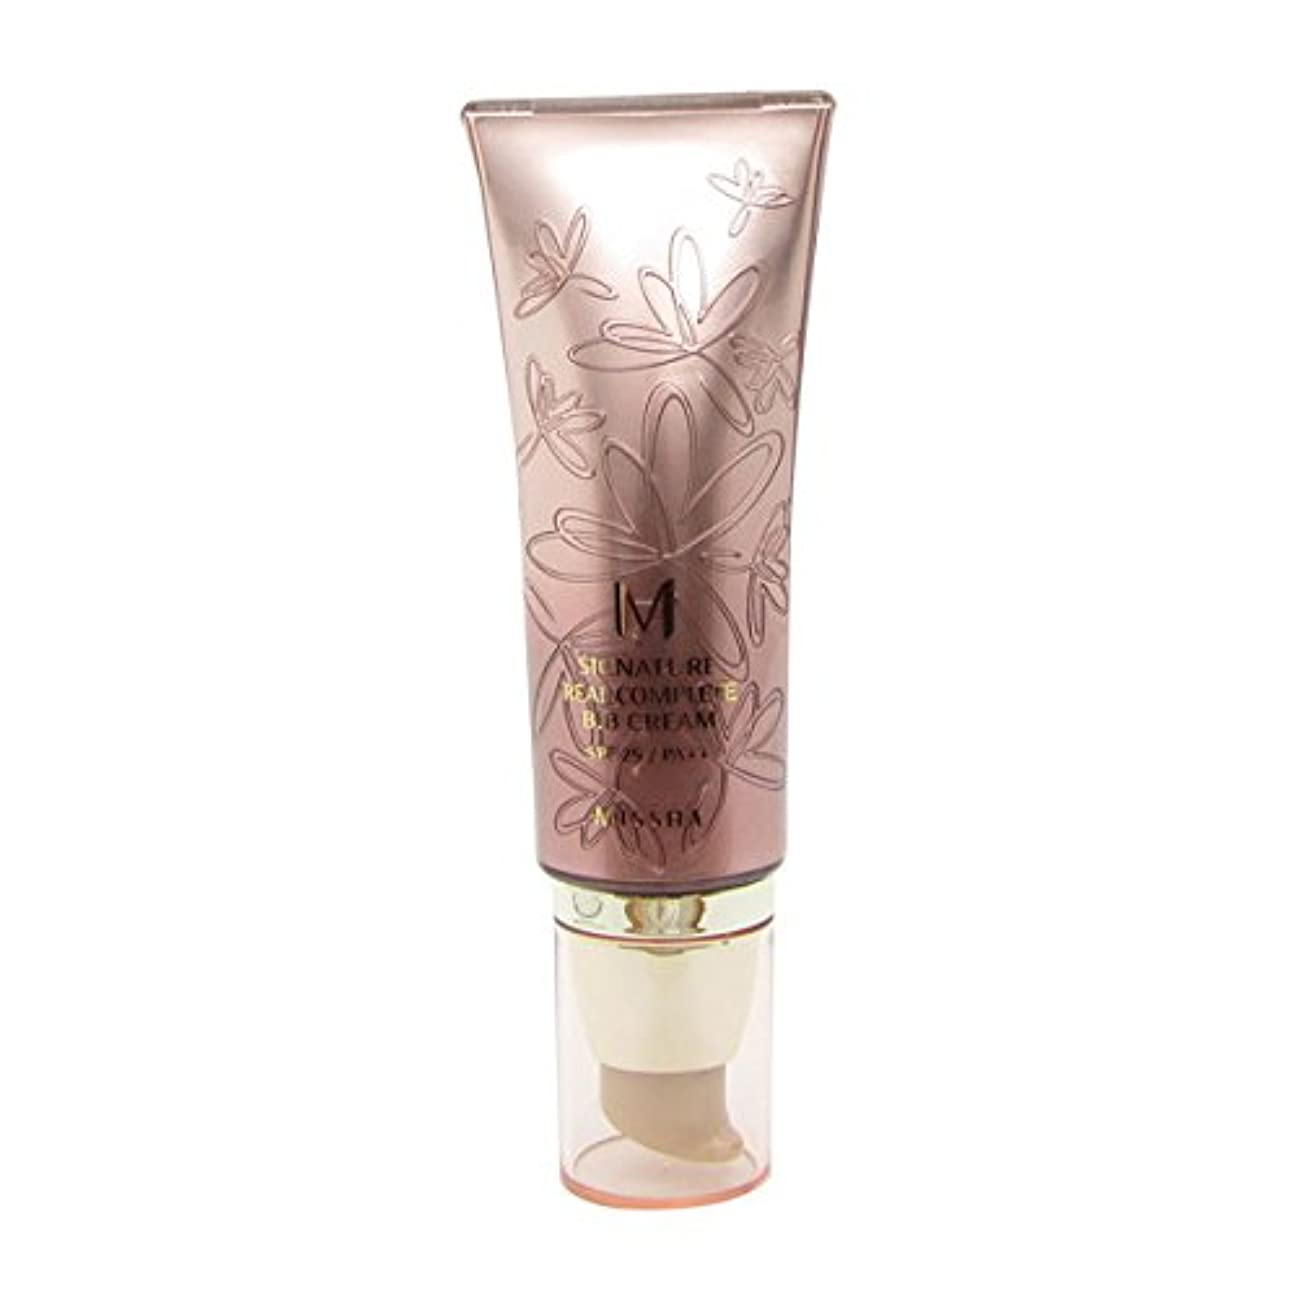 Missha Signature Real Complete Bb Cream Fps25/pa++ No.13 Light Milky Beige 45g [並行輸入品]